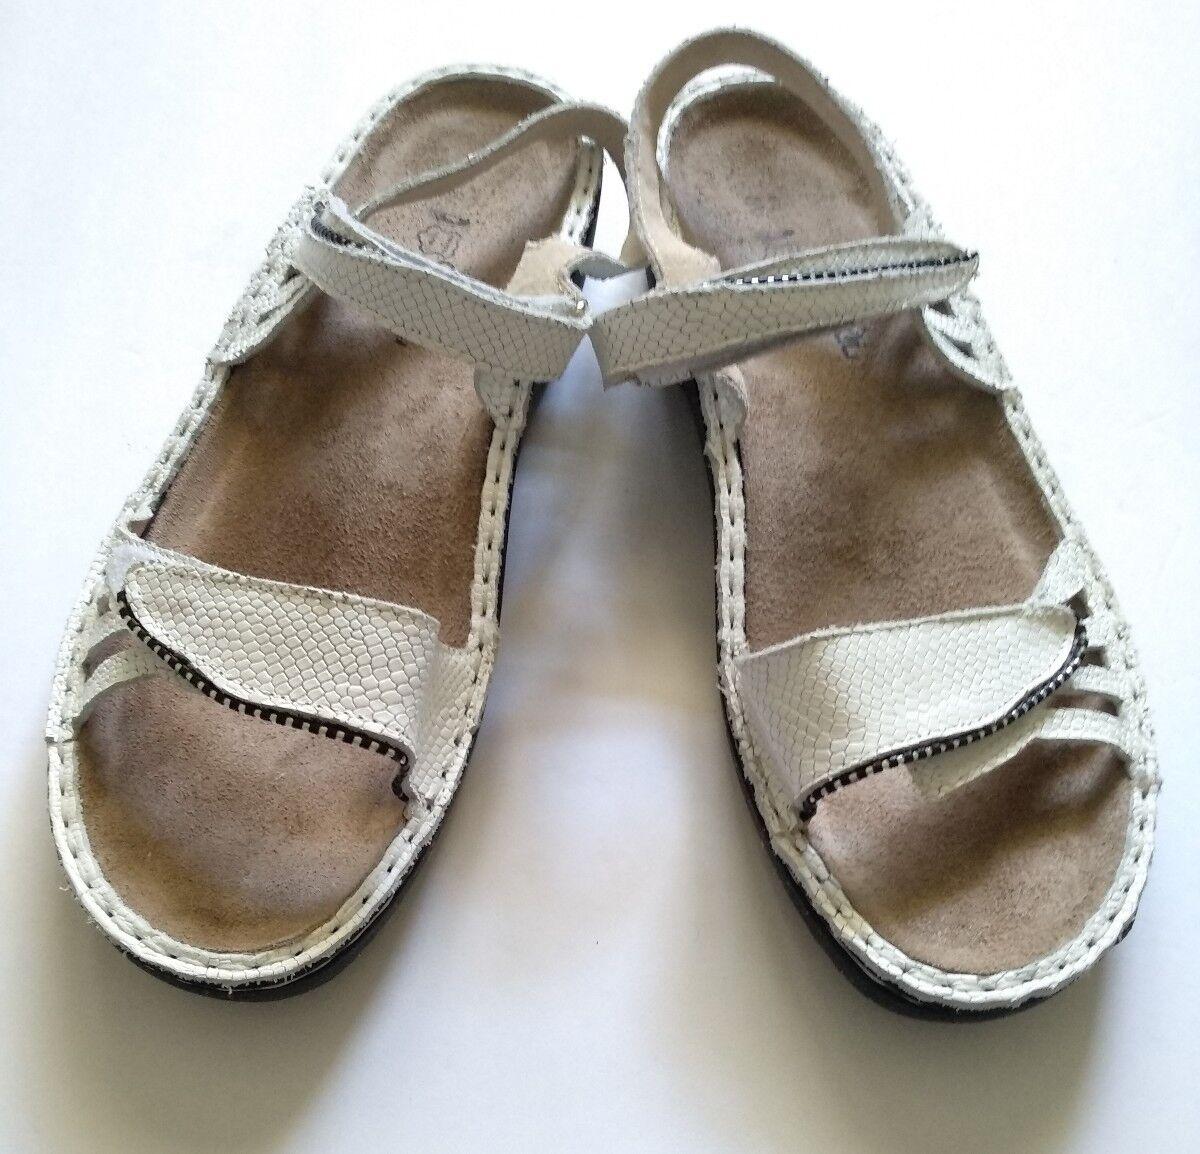 Naot donna bianca cut leather slingback sandals sz.40 (US 8) 8) 8) e64883